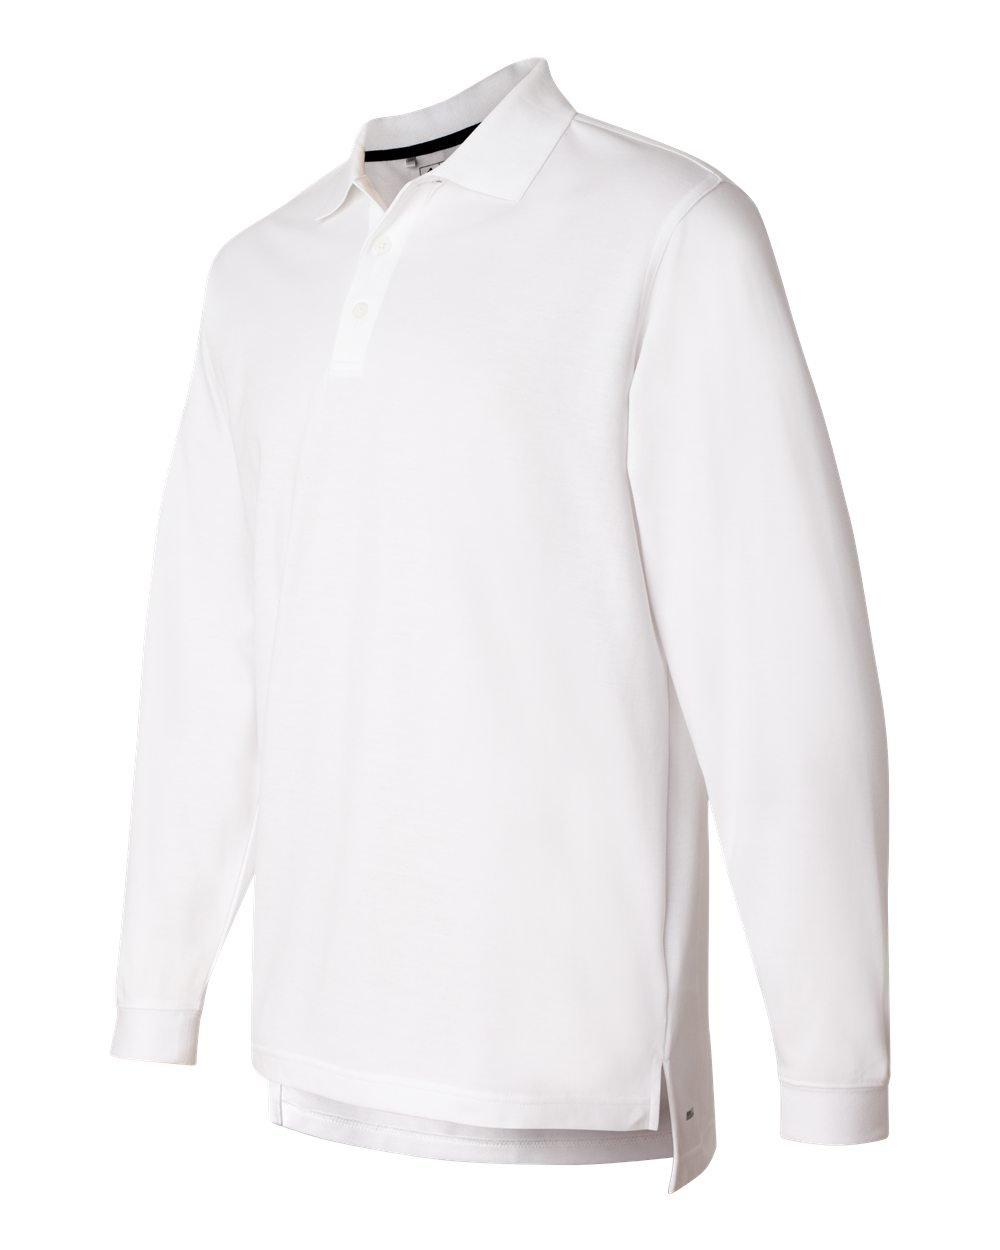 adidas climalite long sleeve golf shirts